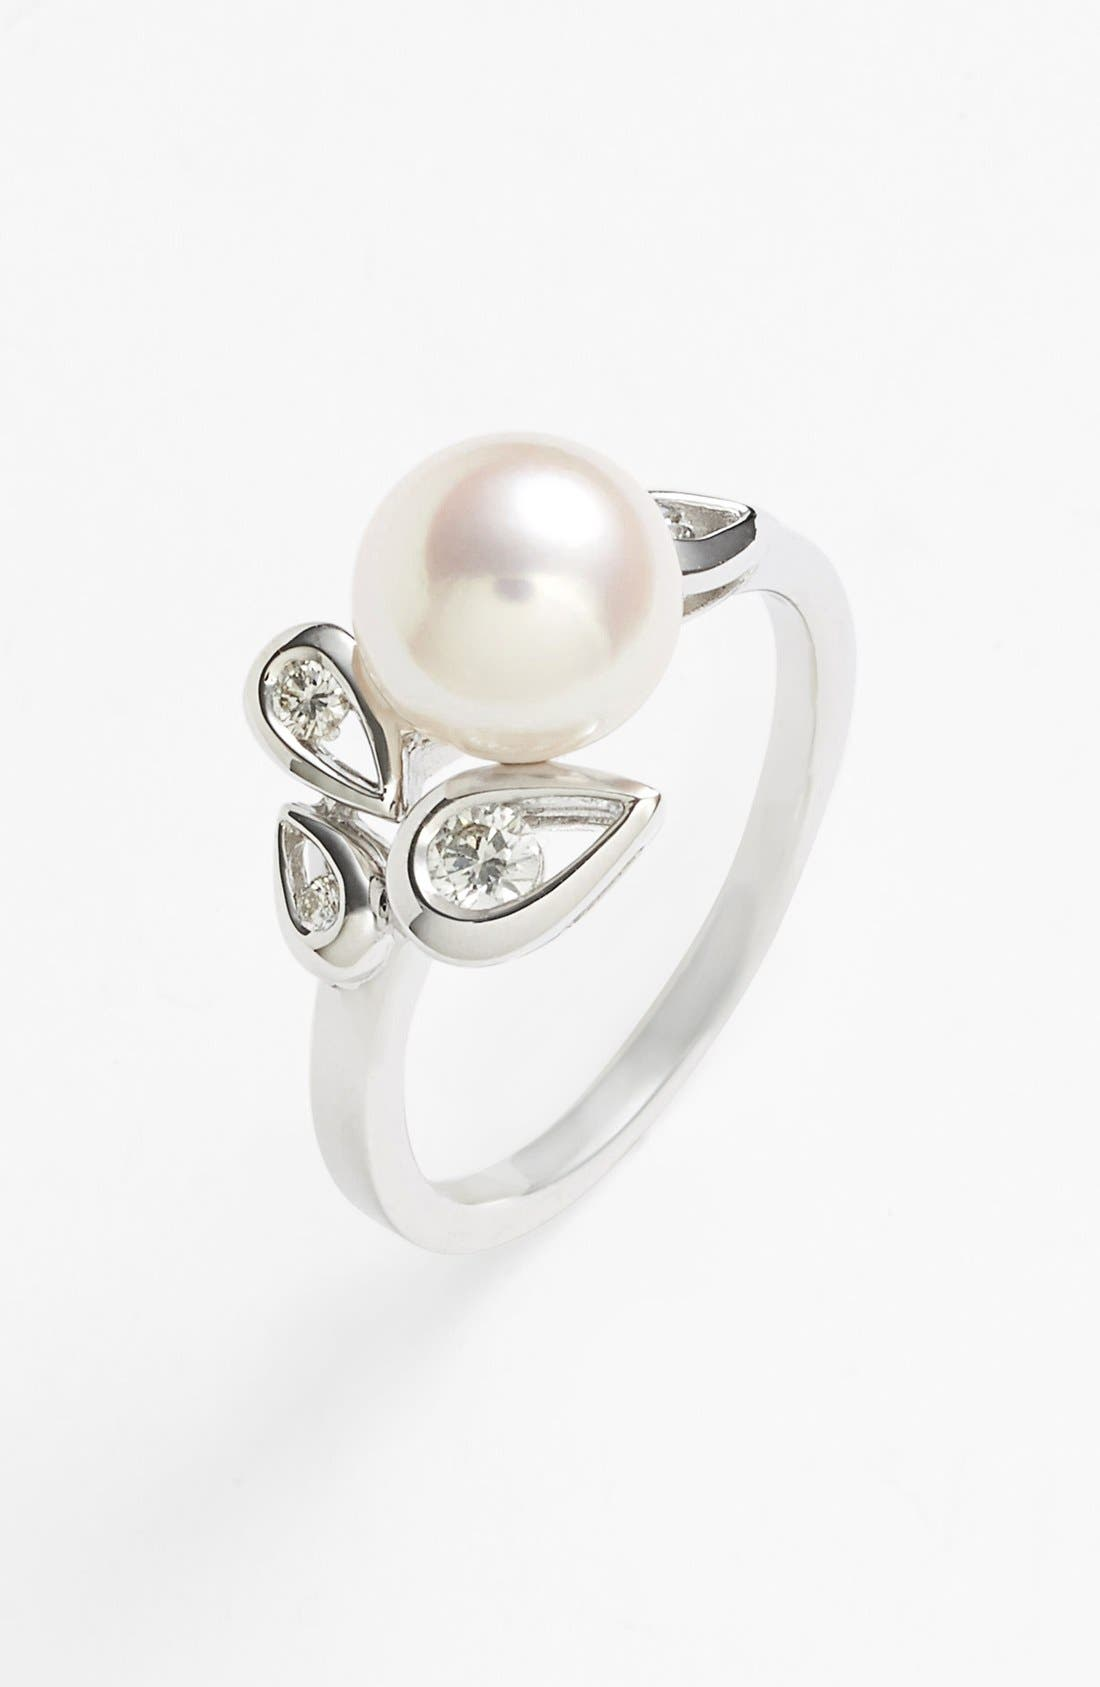 Main Image - Mikimoto Akoya Pearl & Diamond Ring